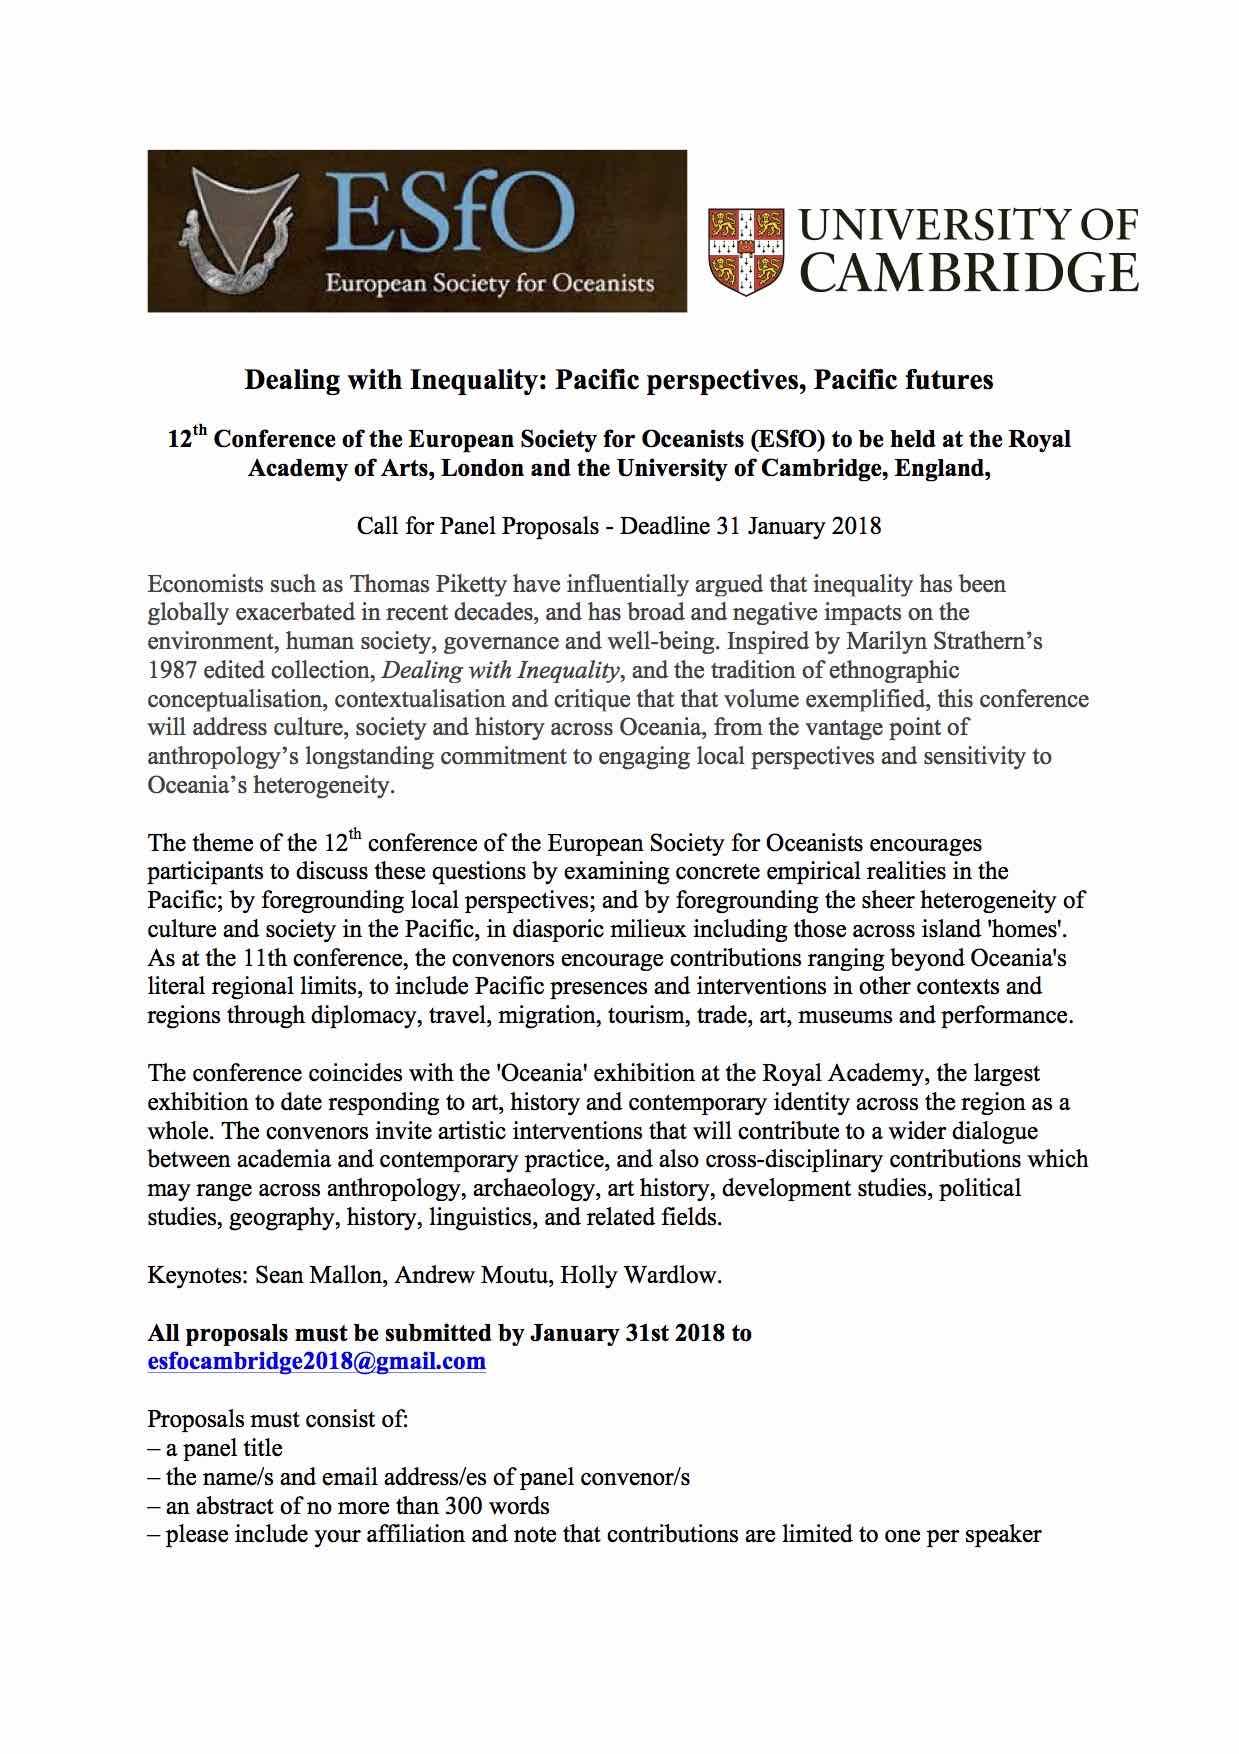 12th ESfO Conference in Cambridge, UK | Oceanic Art Society